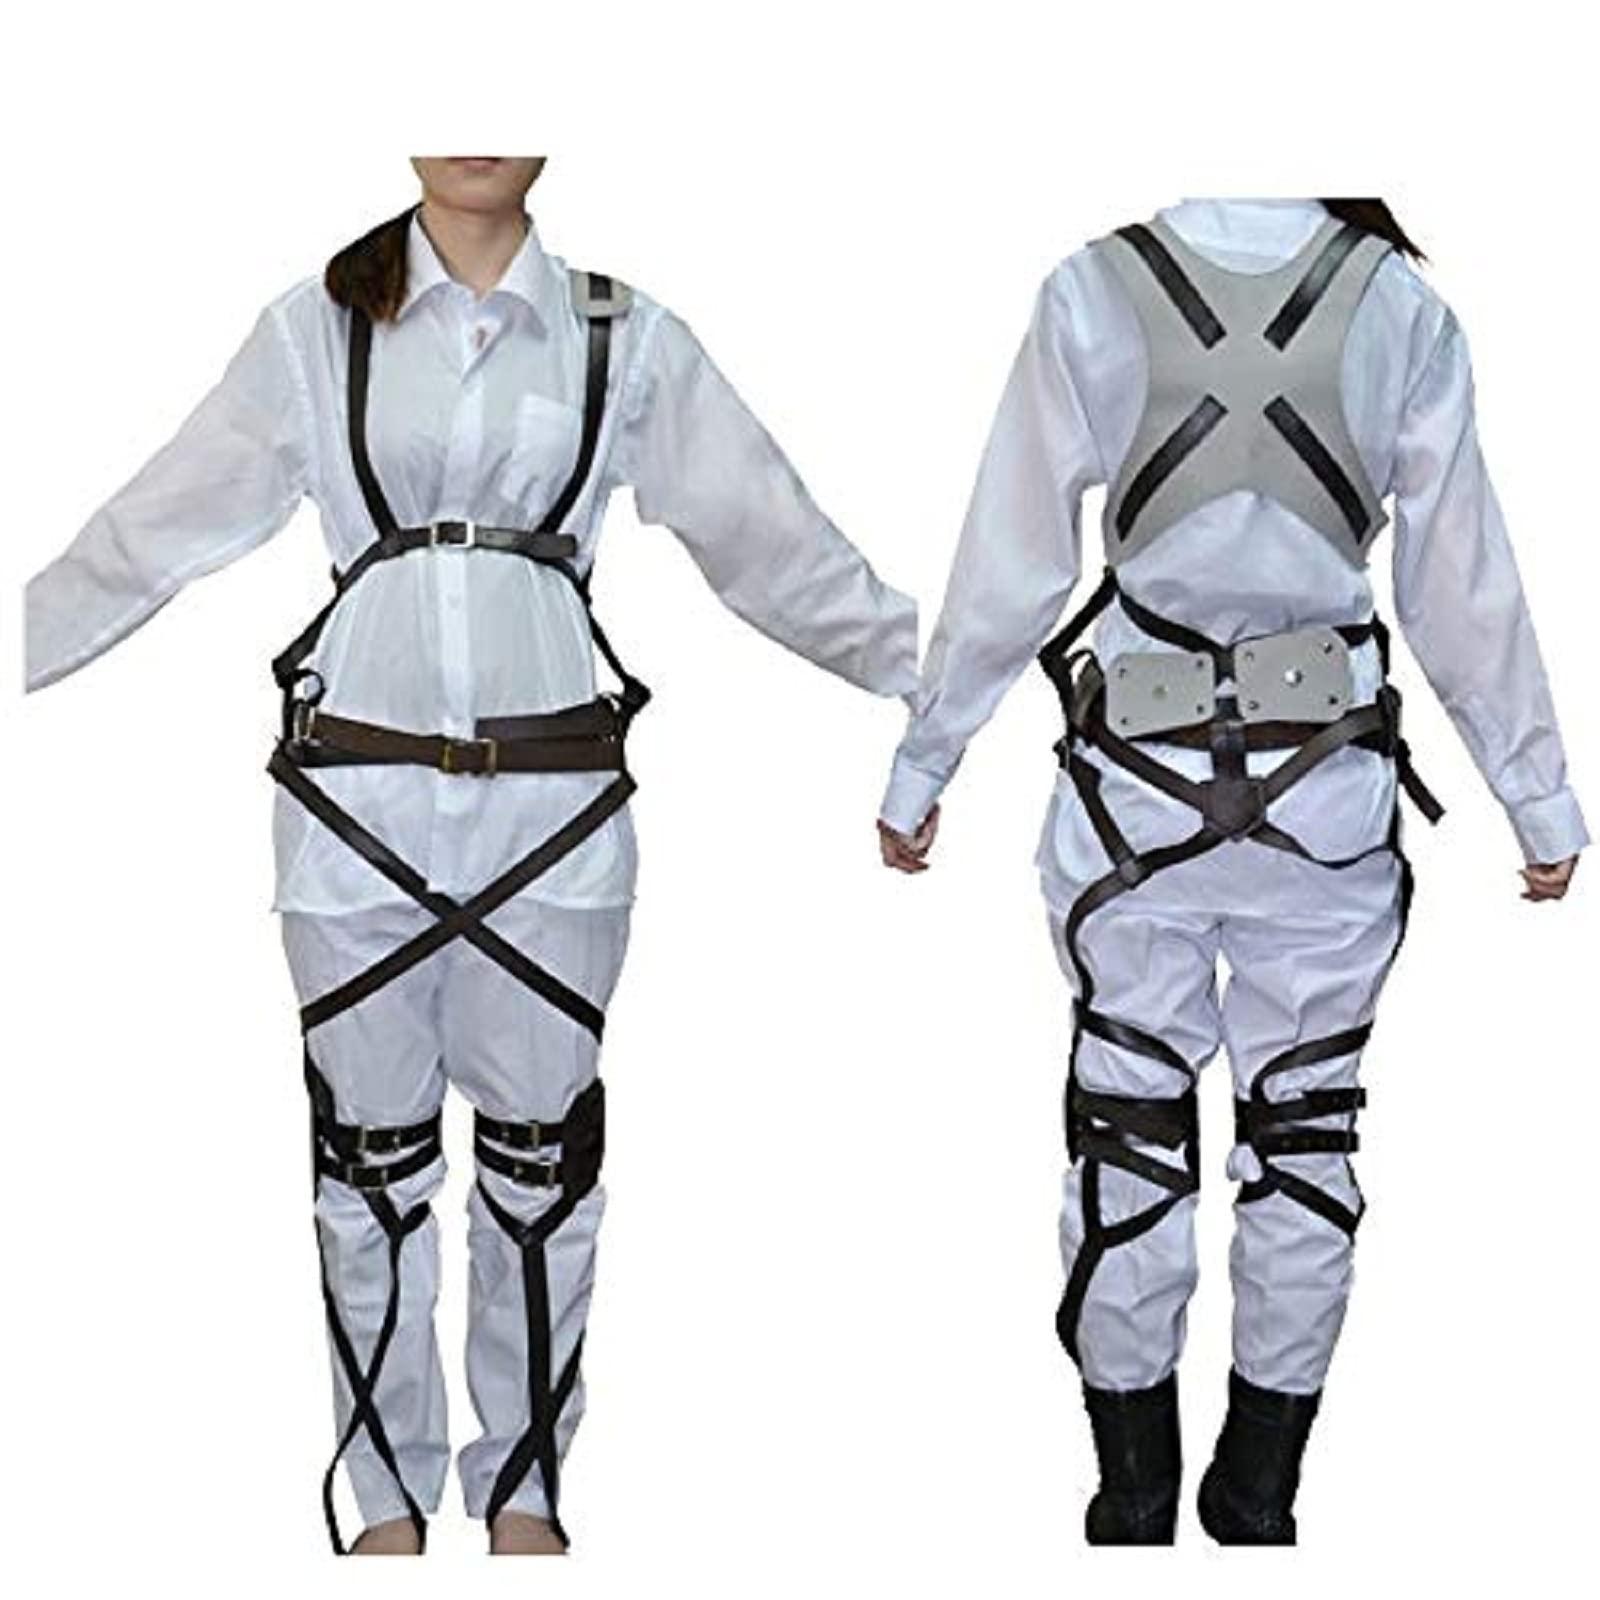 1 X Cosplay Attack on Titan Shingeki no Kyojin Recon Corps Belt Hookshot Costume, Browen, free size